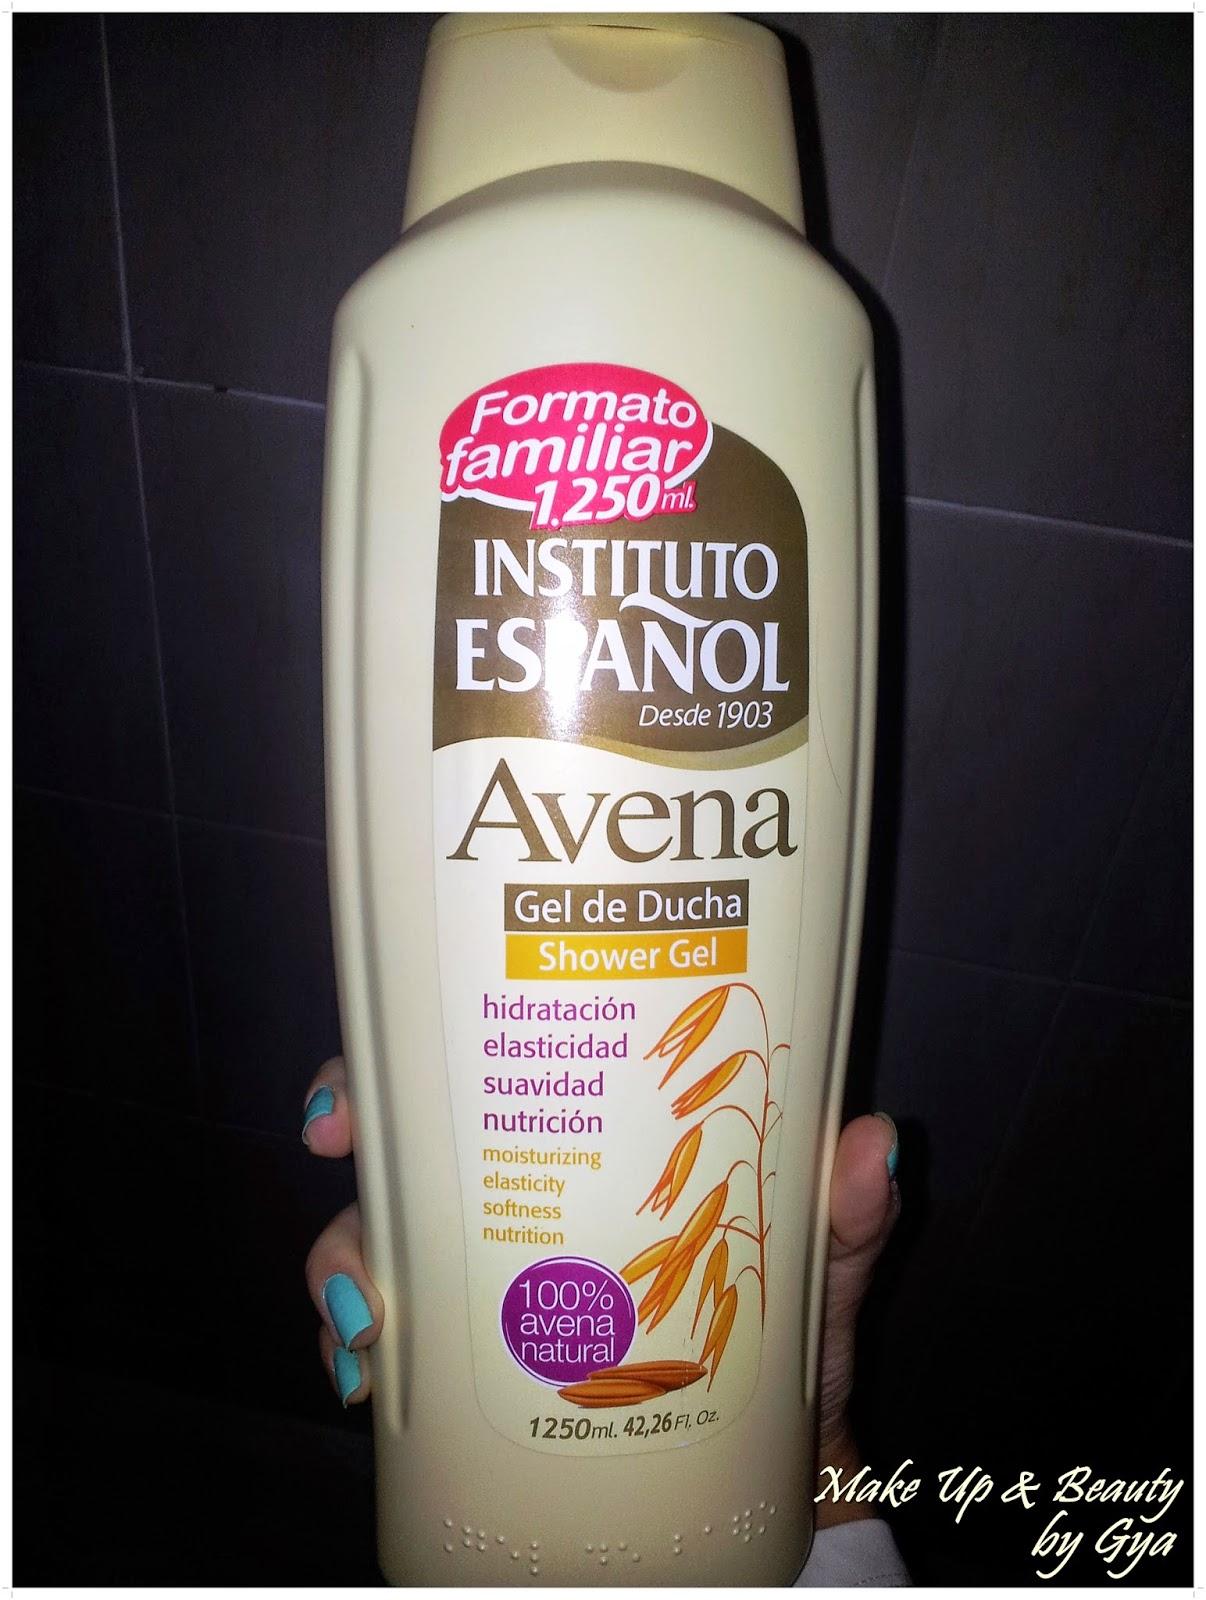 Gel de ducha con avena Instituto Español